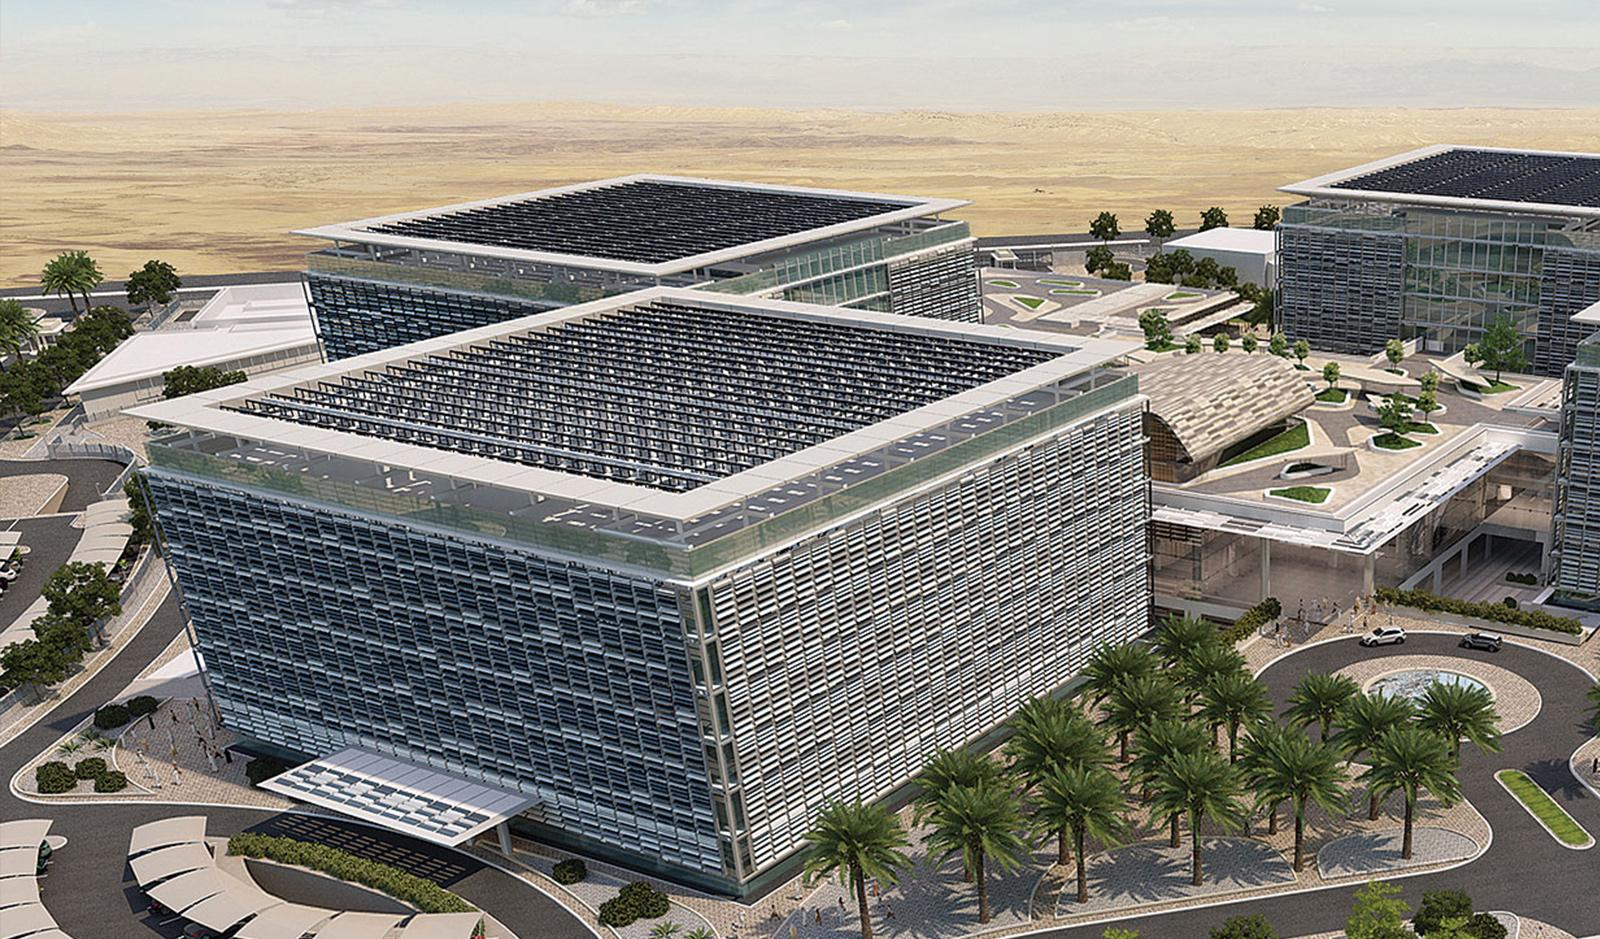 Saudi Electric Co. HQ